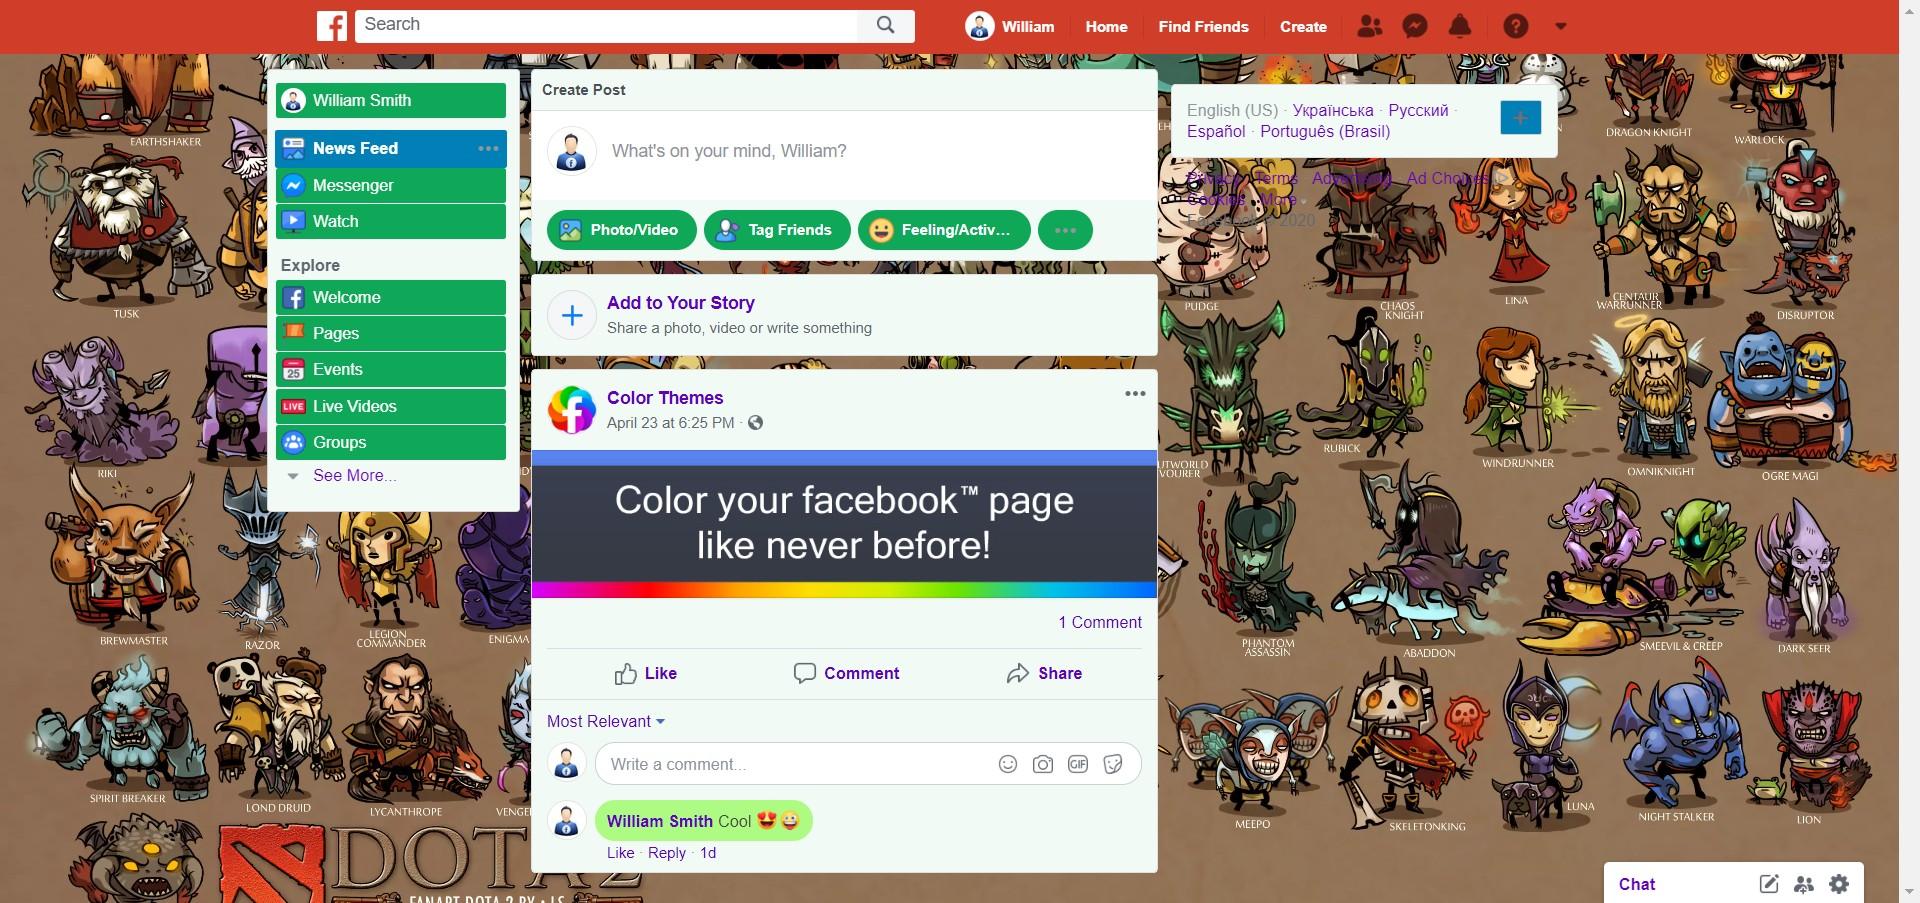 Dota 2 Heroes screenshot of Games